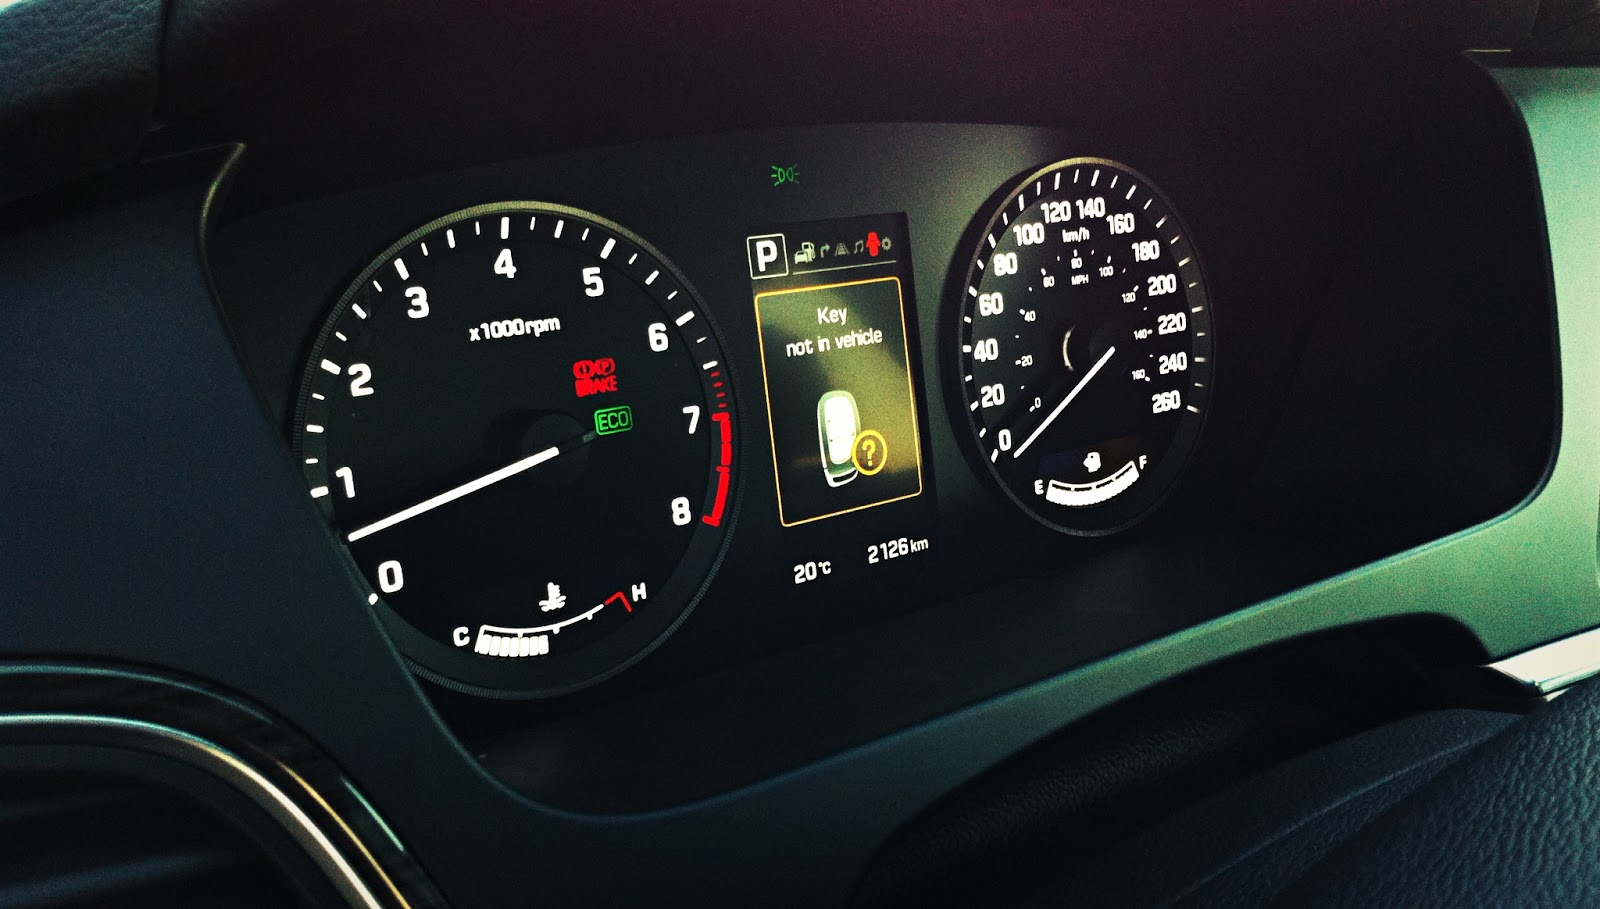 2015 Hyundai Sonata gauge cluster